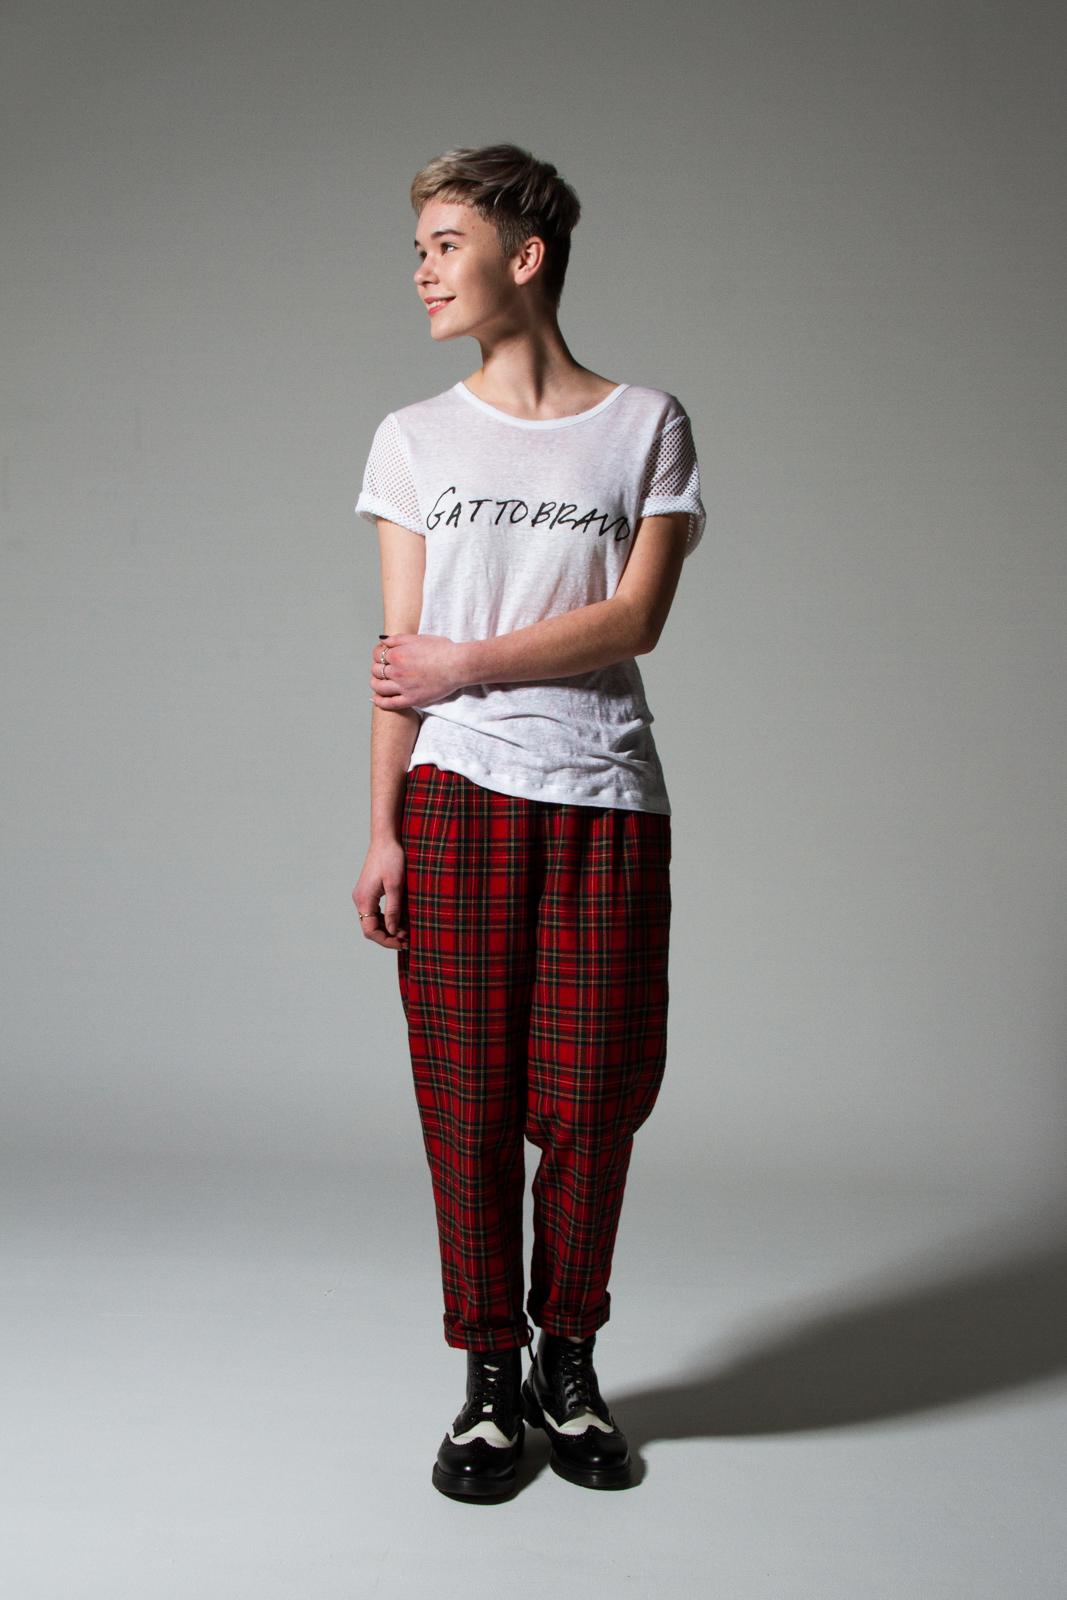 Gattobravo T Shirt $129 with opshop pants & Dr Martens